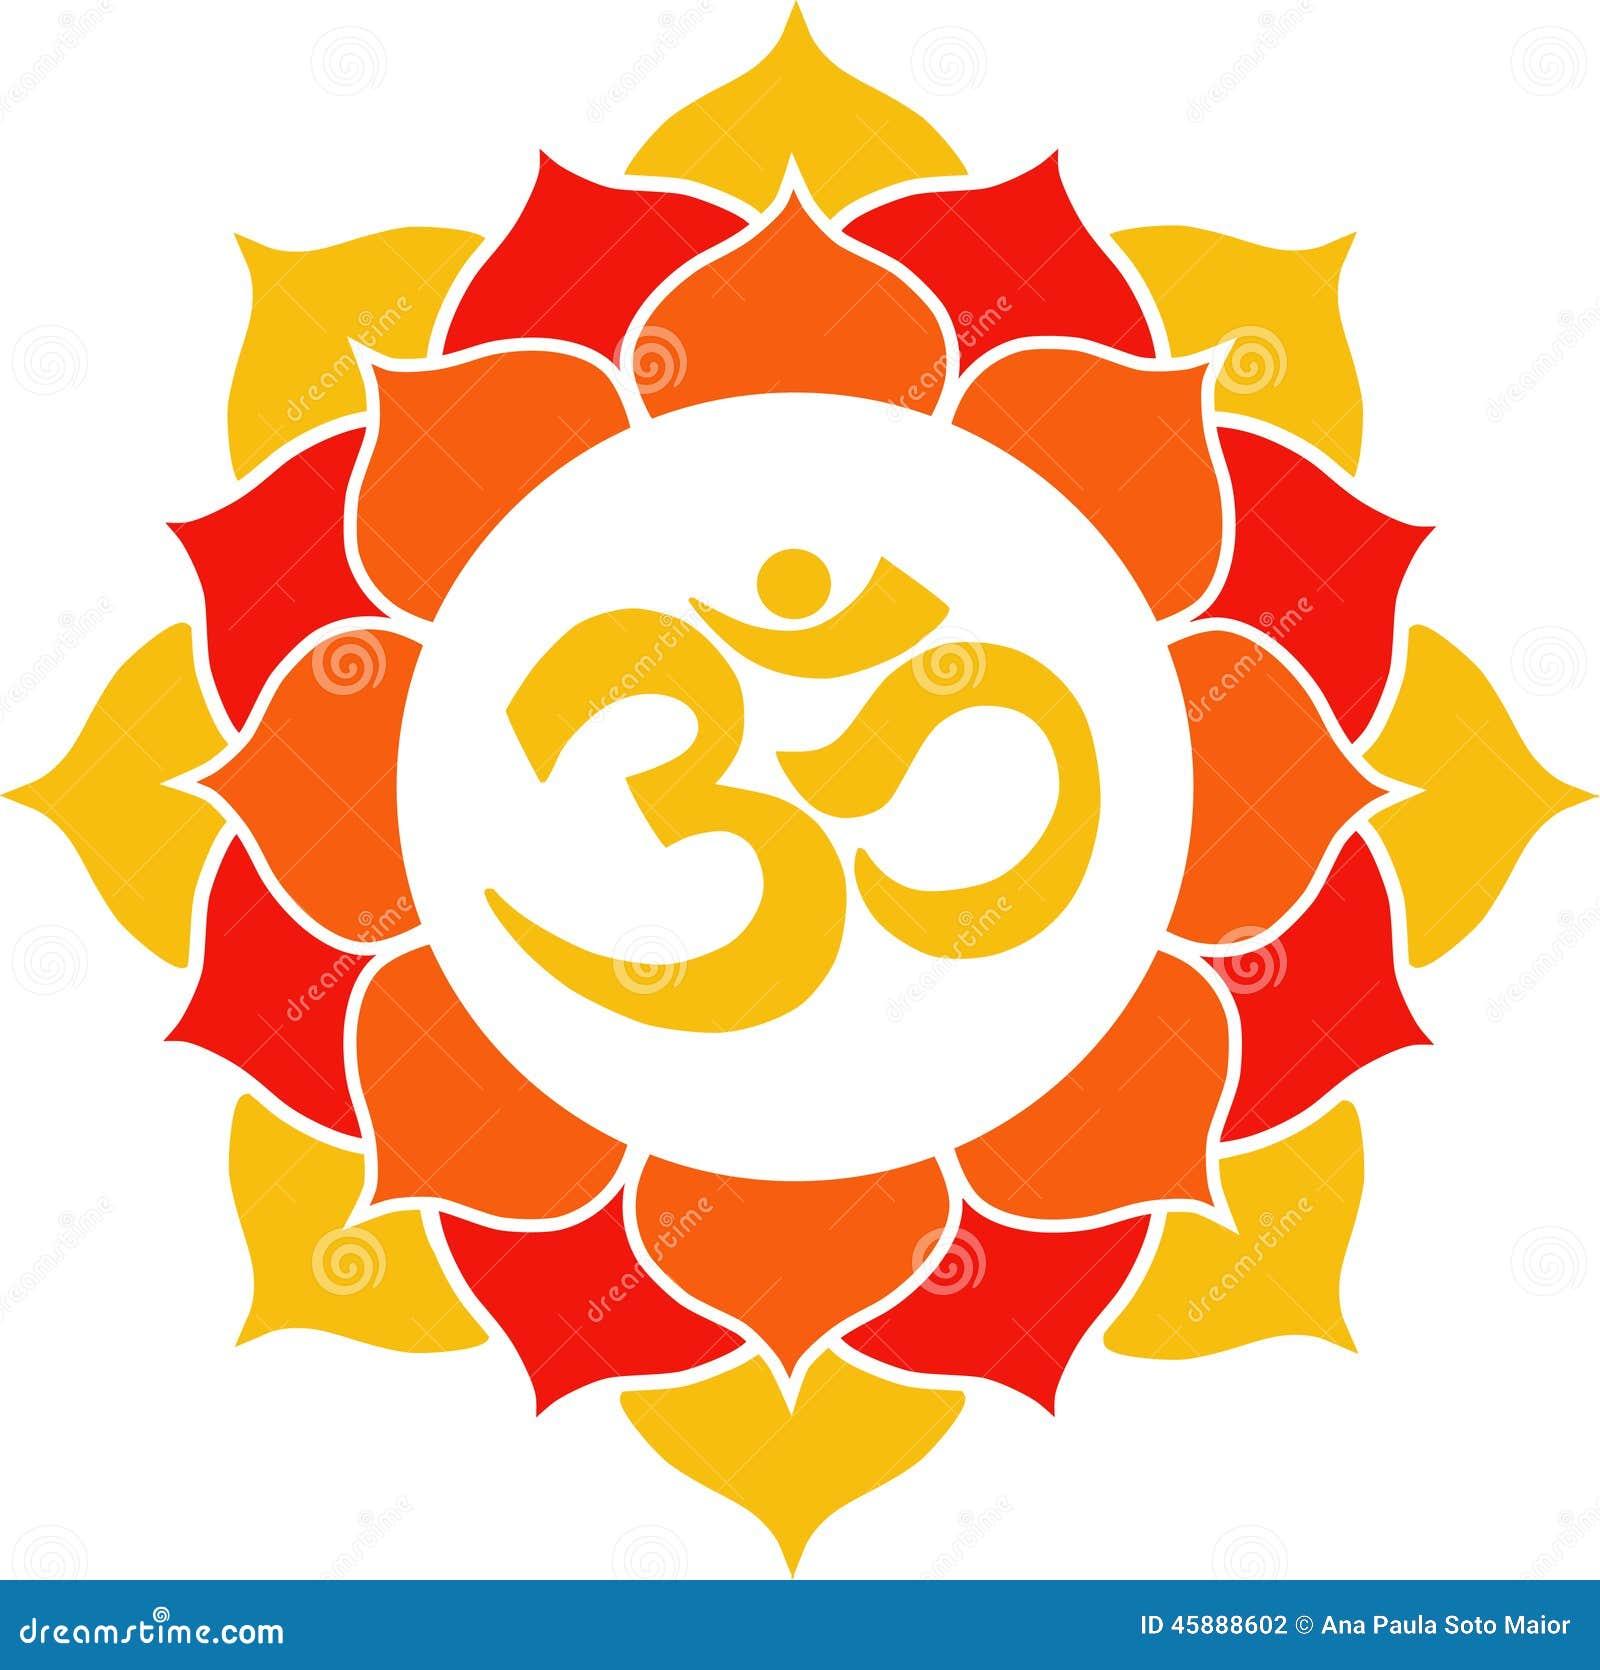 Orange lotus flower mandala stock abbildung illustration von download orange lotus flower mandala stock abbildung illustration von mandalas indisch 45888602 izmirmasajfo